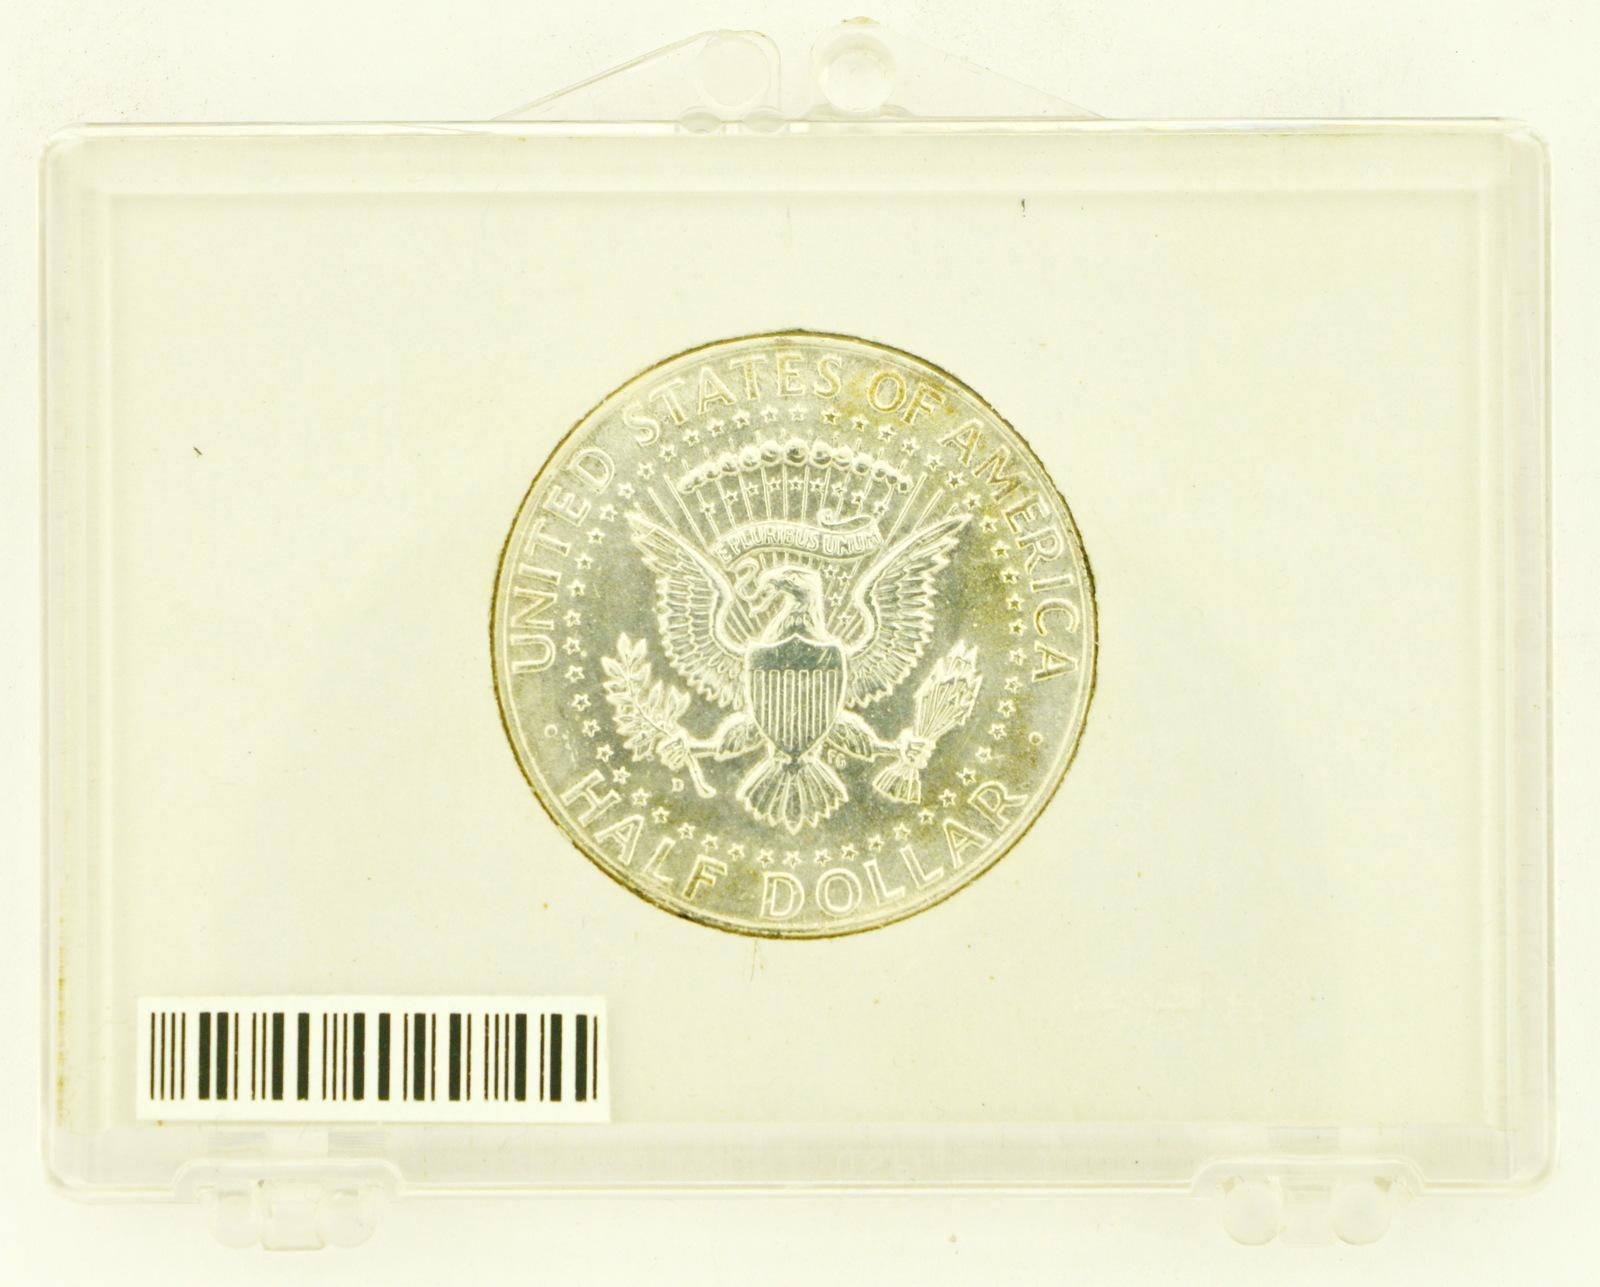 1964-D Silver Kennedy Half Dollar RATING: (UNC) Uncirculated